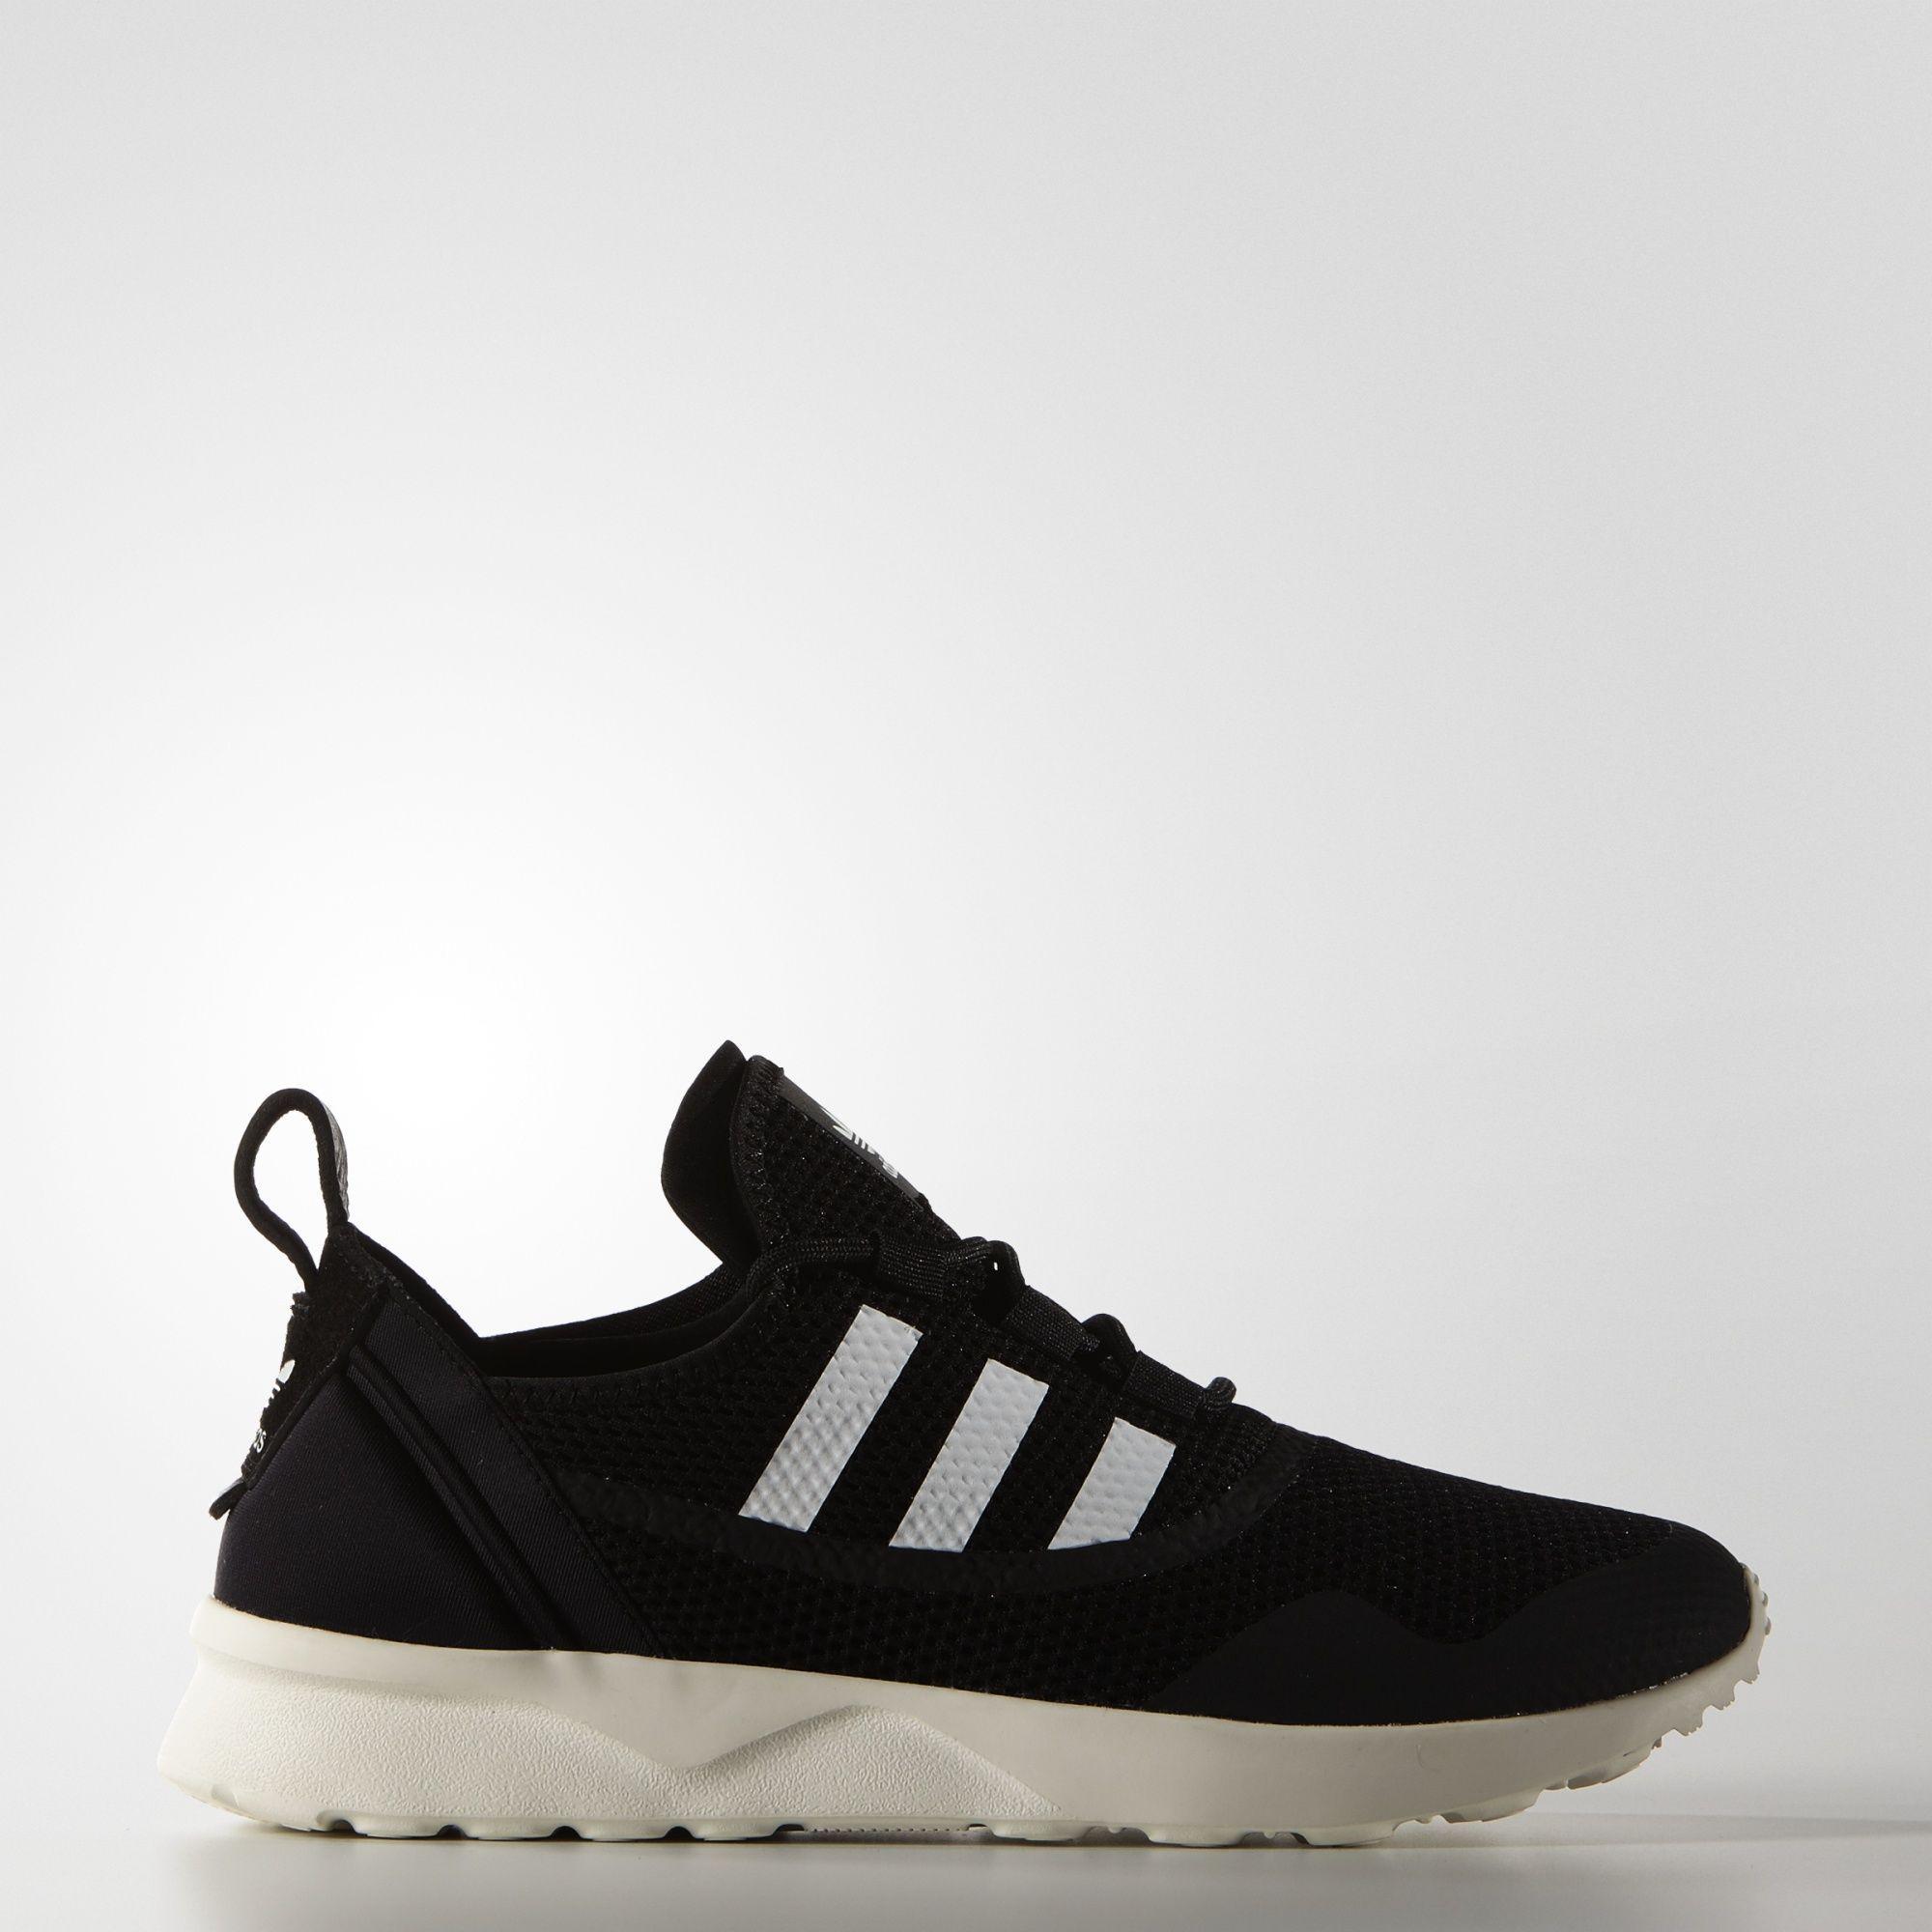 mi ZX Flux ADV ShoesWomen's Originals uB9ily